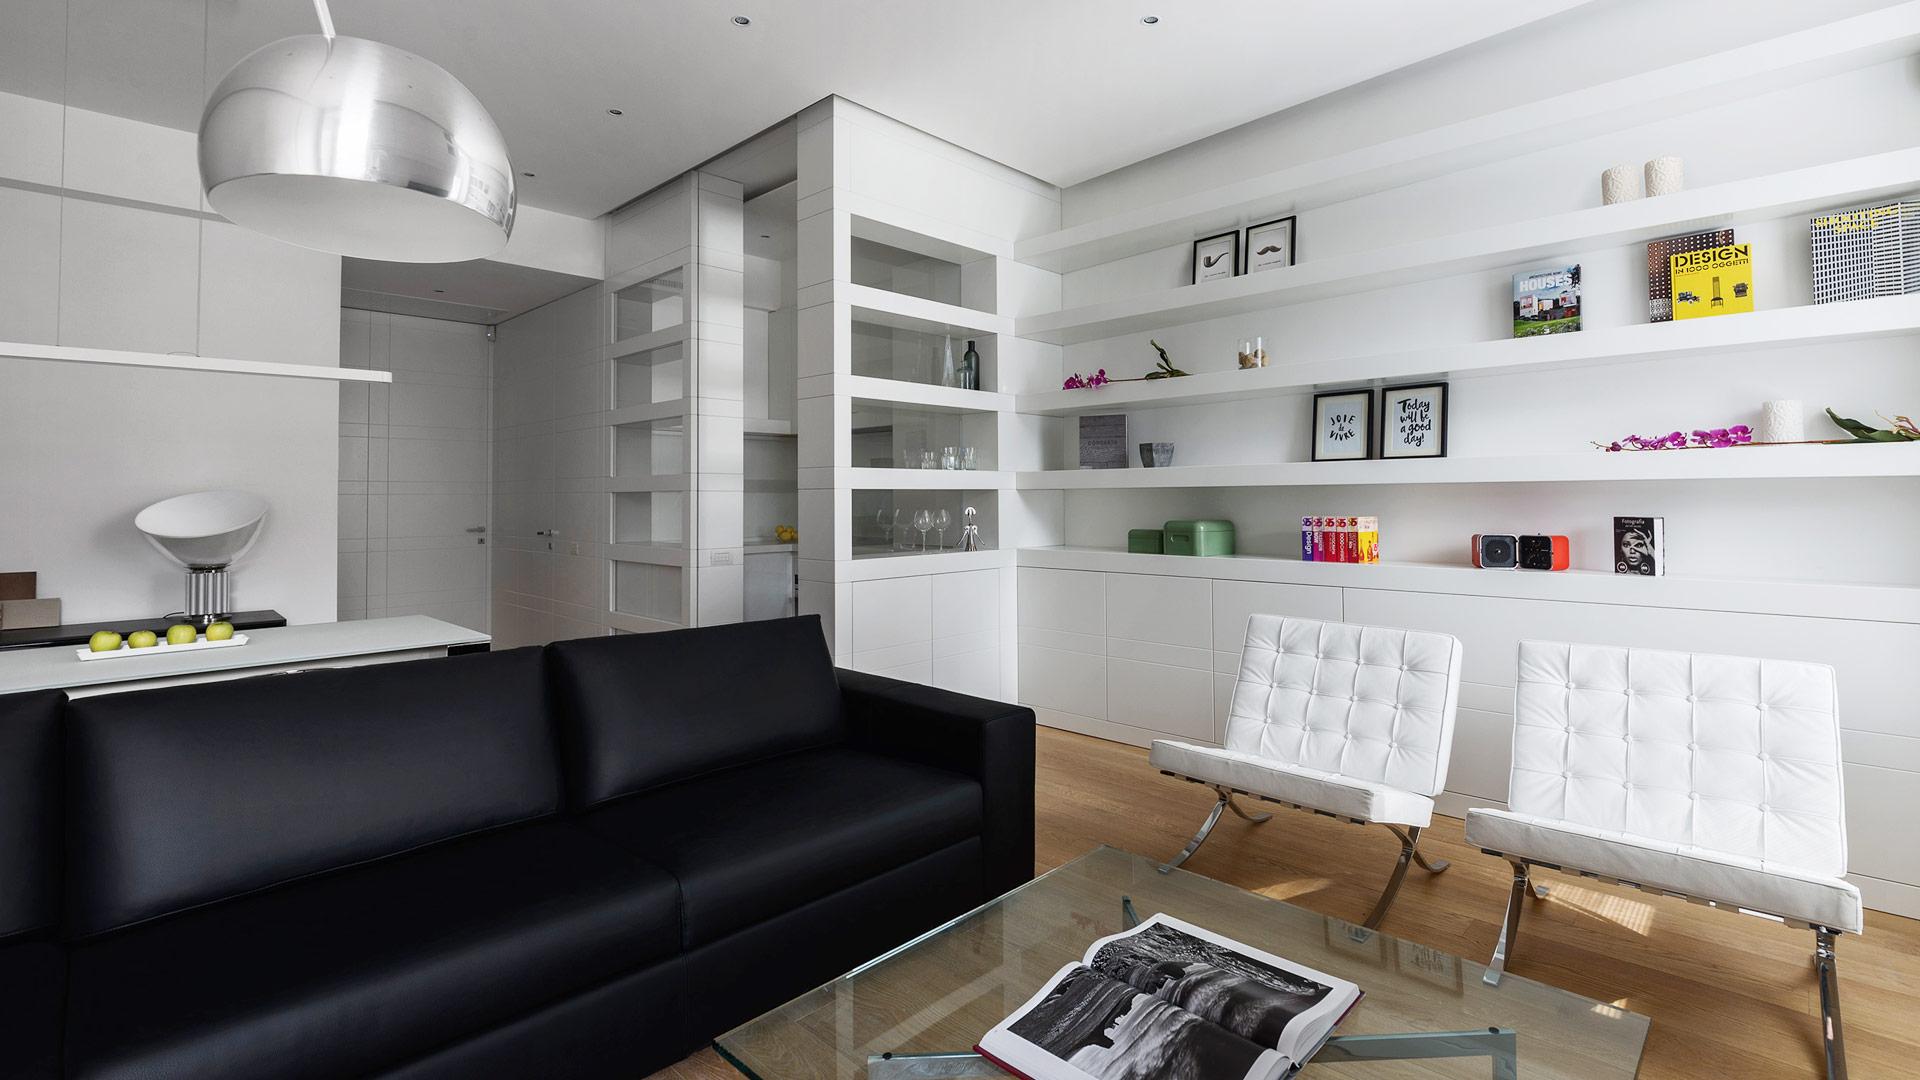 Interior: Private apartment in Rome with a simple, unique and functional design - TM Italia - Area-contract-Cicchetti-02